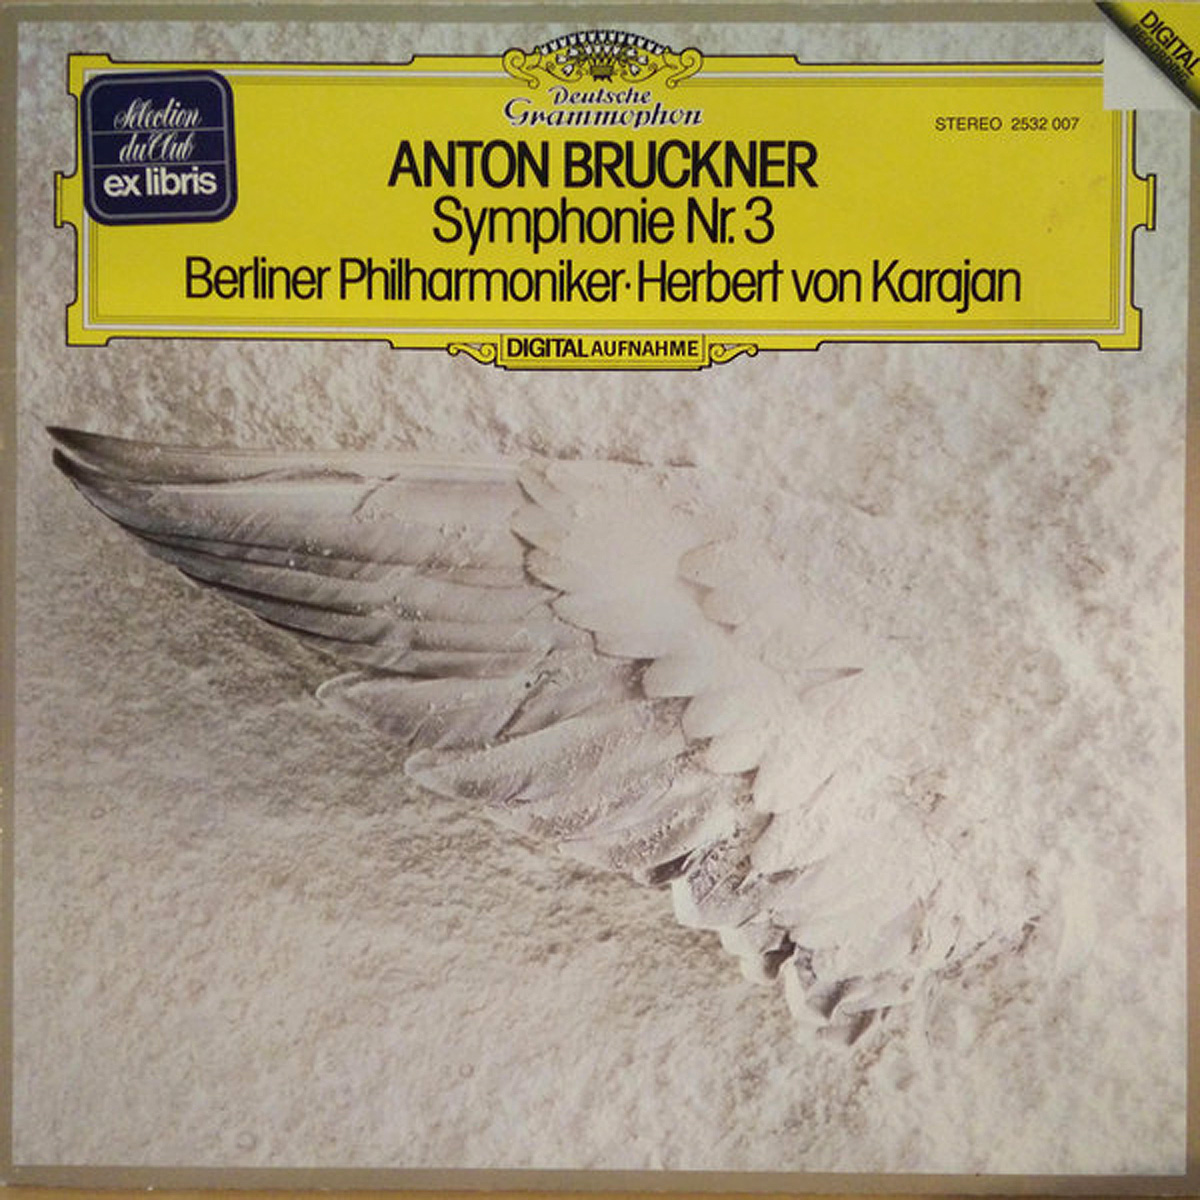 DGG 2532007 Brucknery Symphonie 3 Karajan